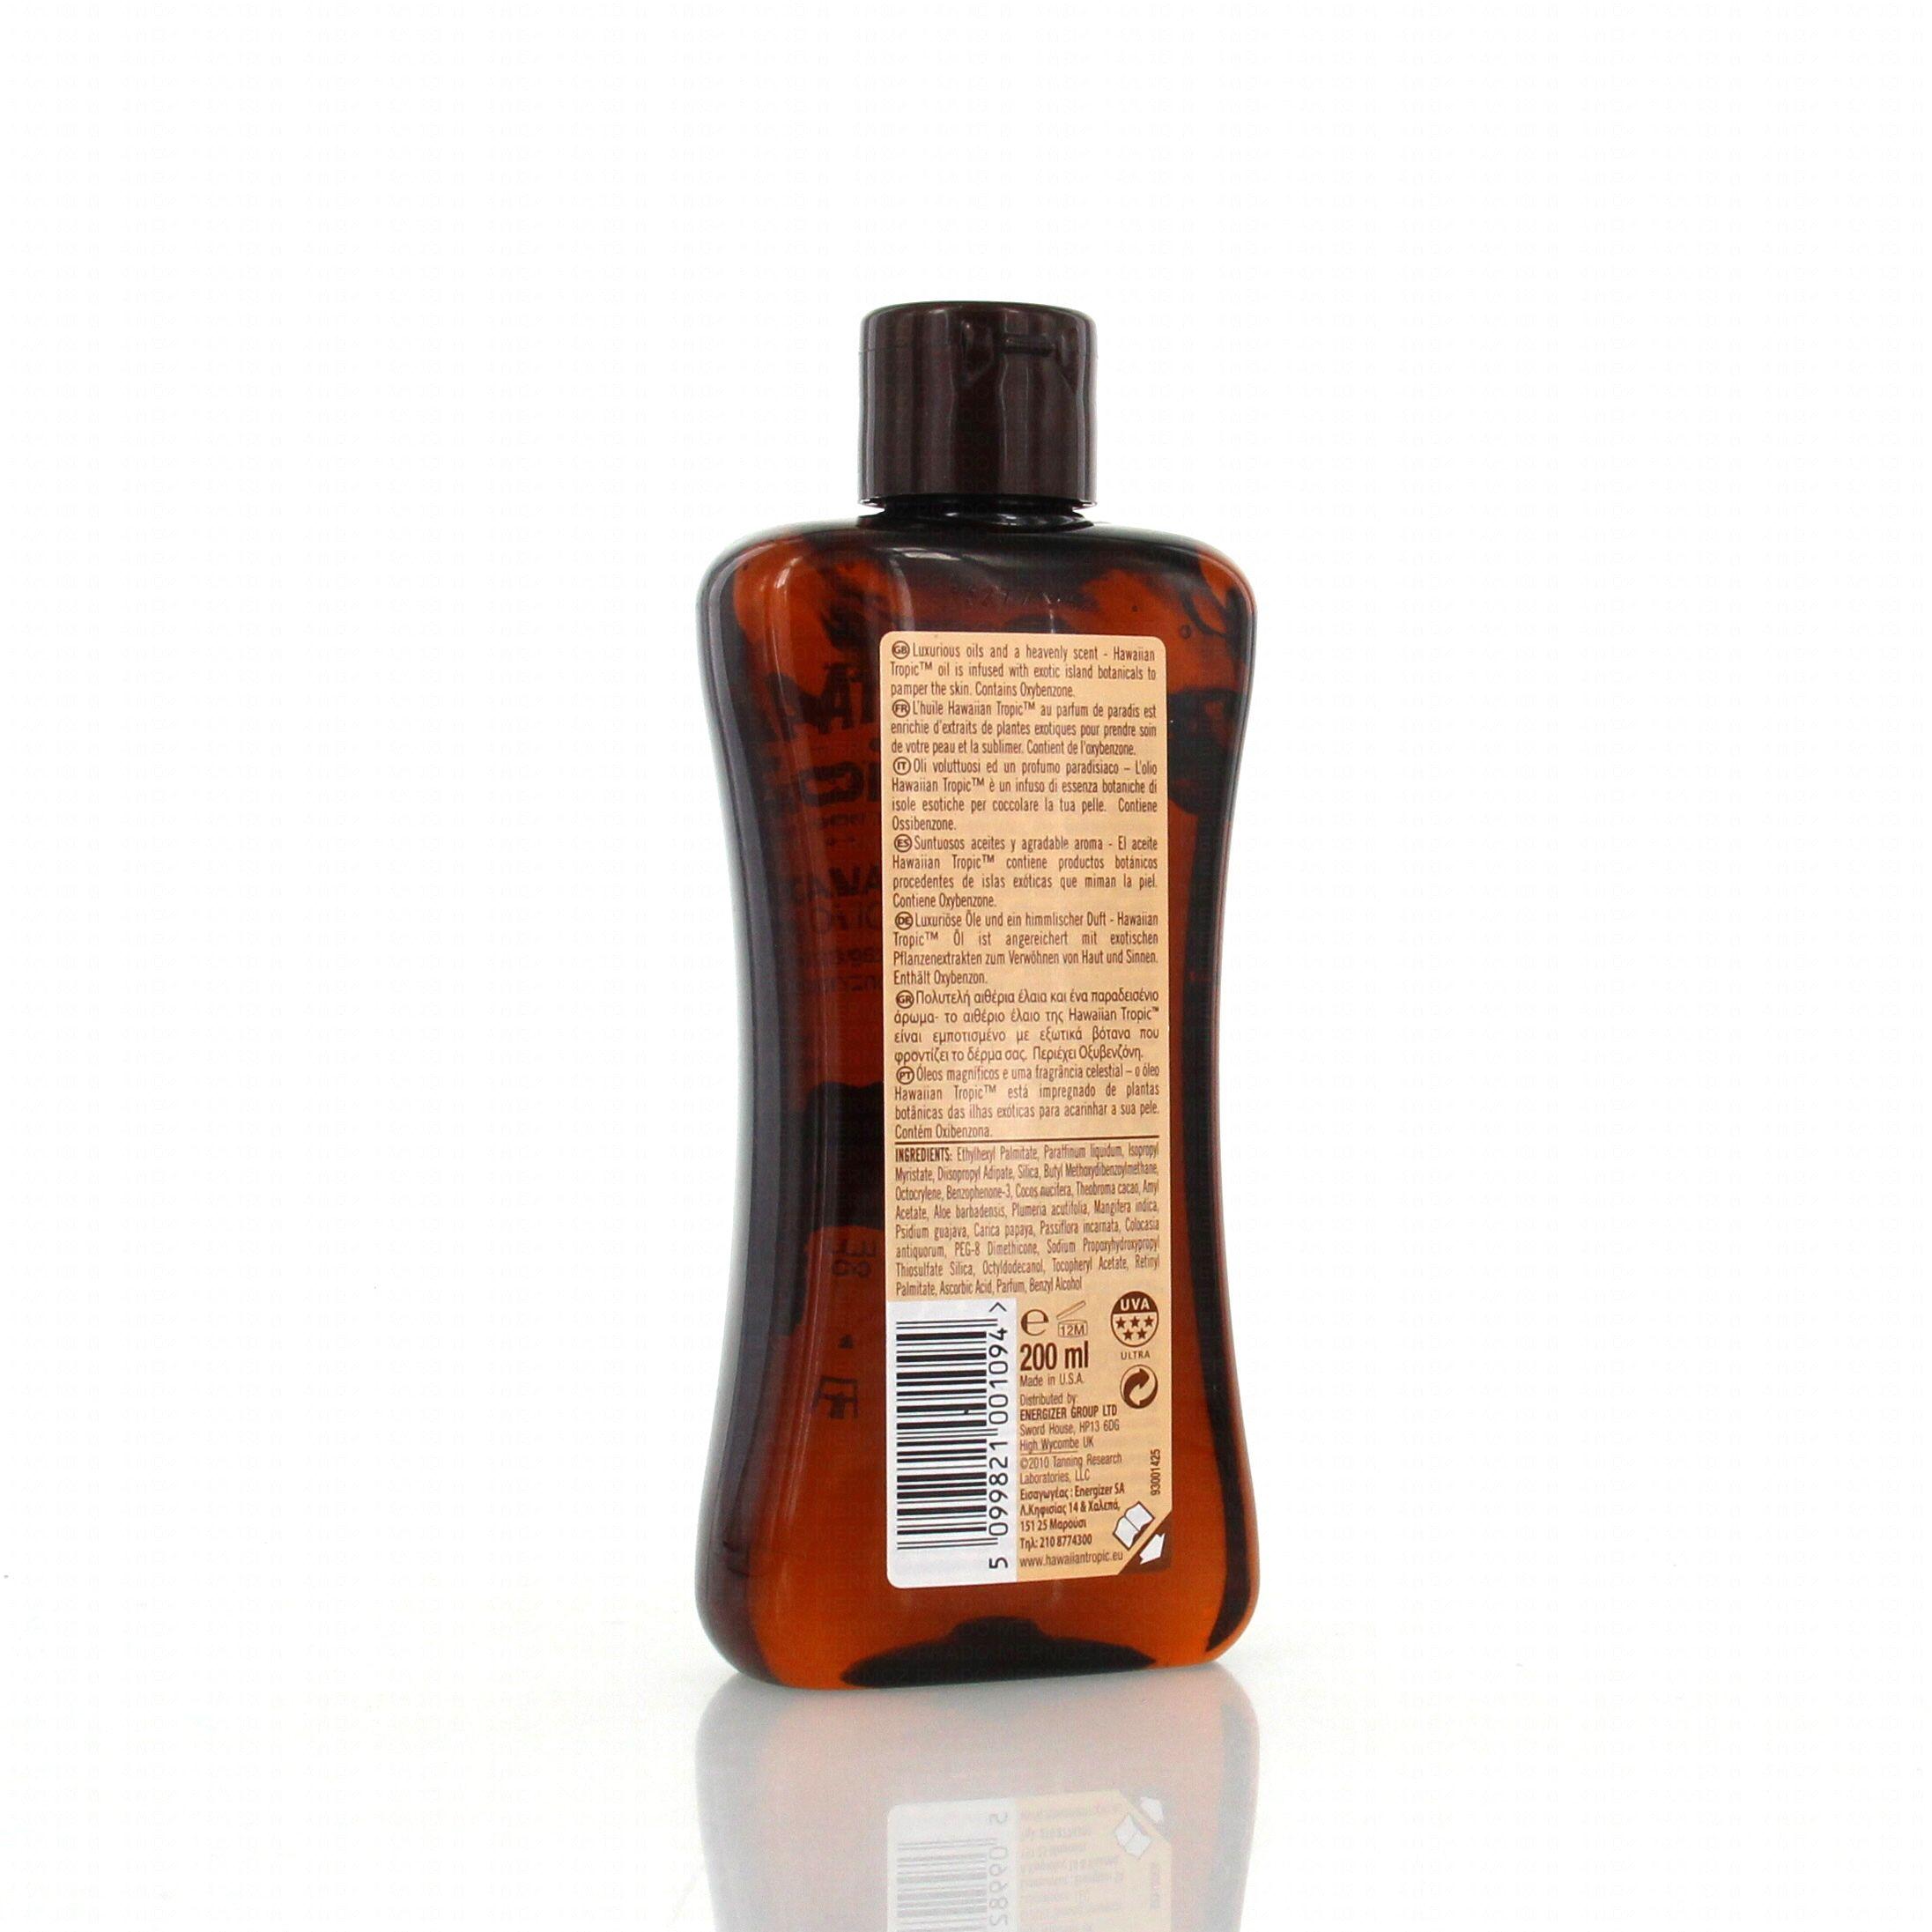 hawaiian tropic huile de bronzage spf4 flacon 200ml parapharmacie en ligne prado mermoz. Black Bedroom Furniture Sets. Home Design Ideas